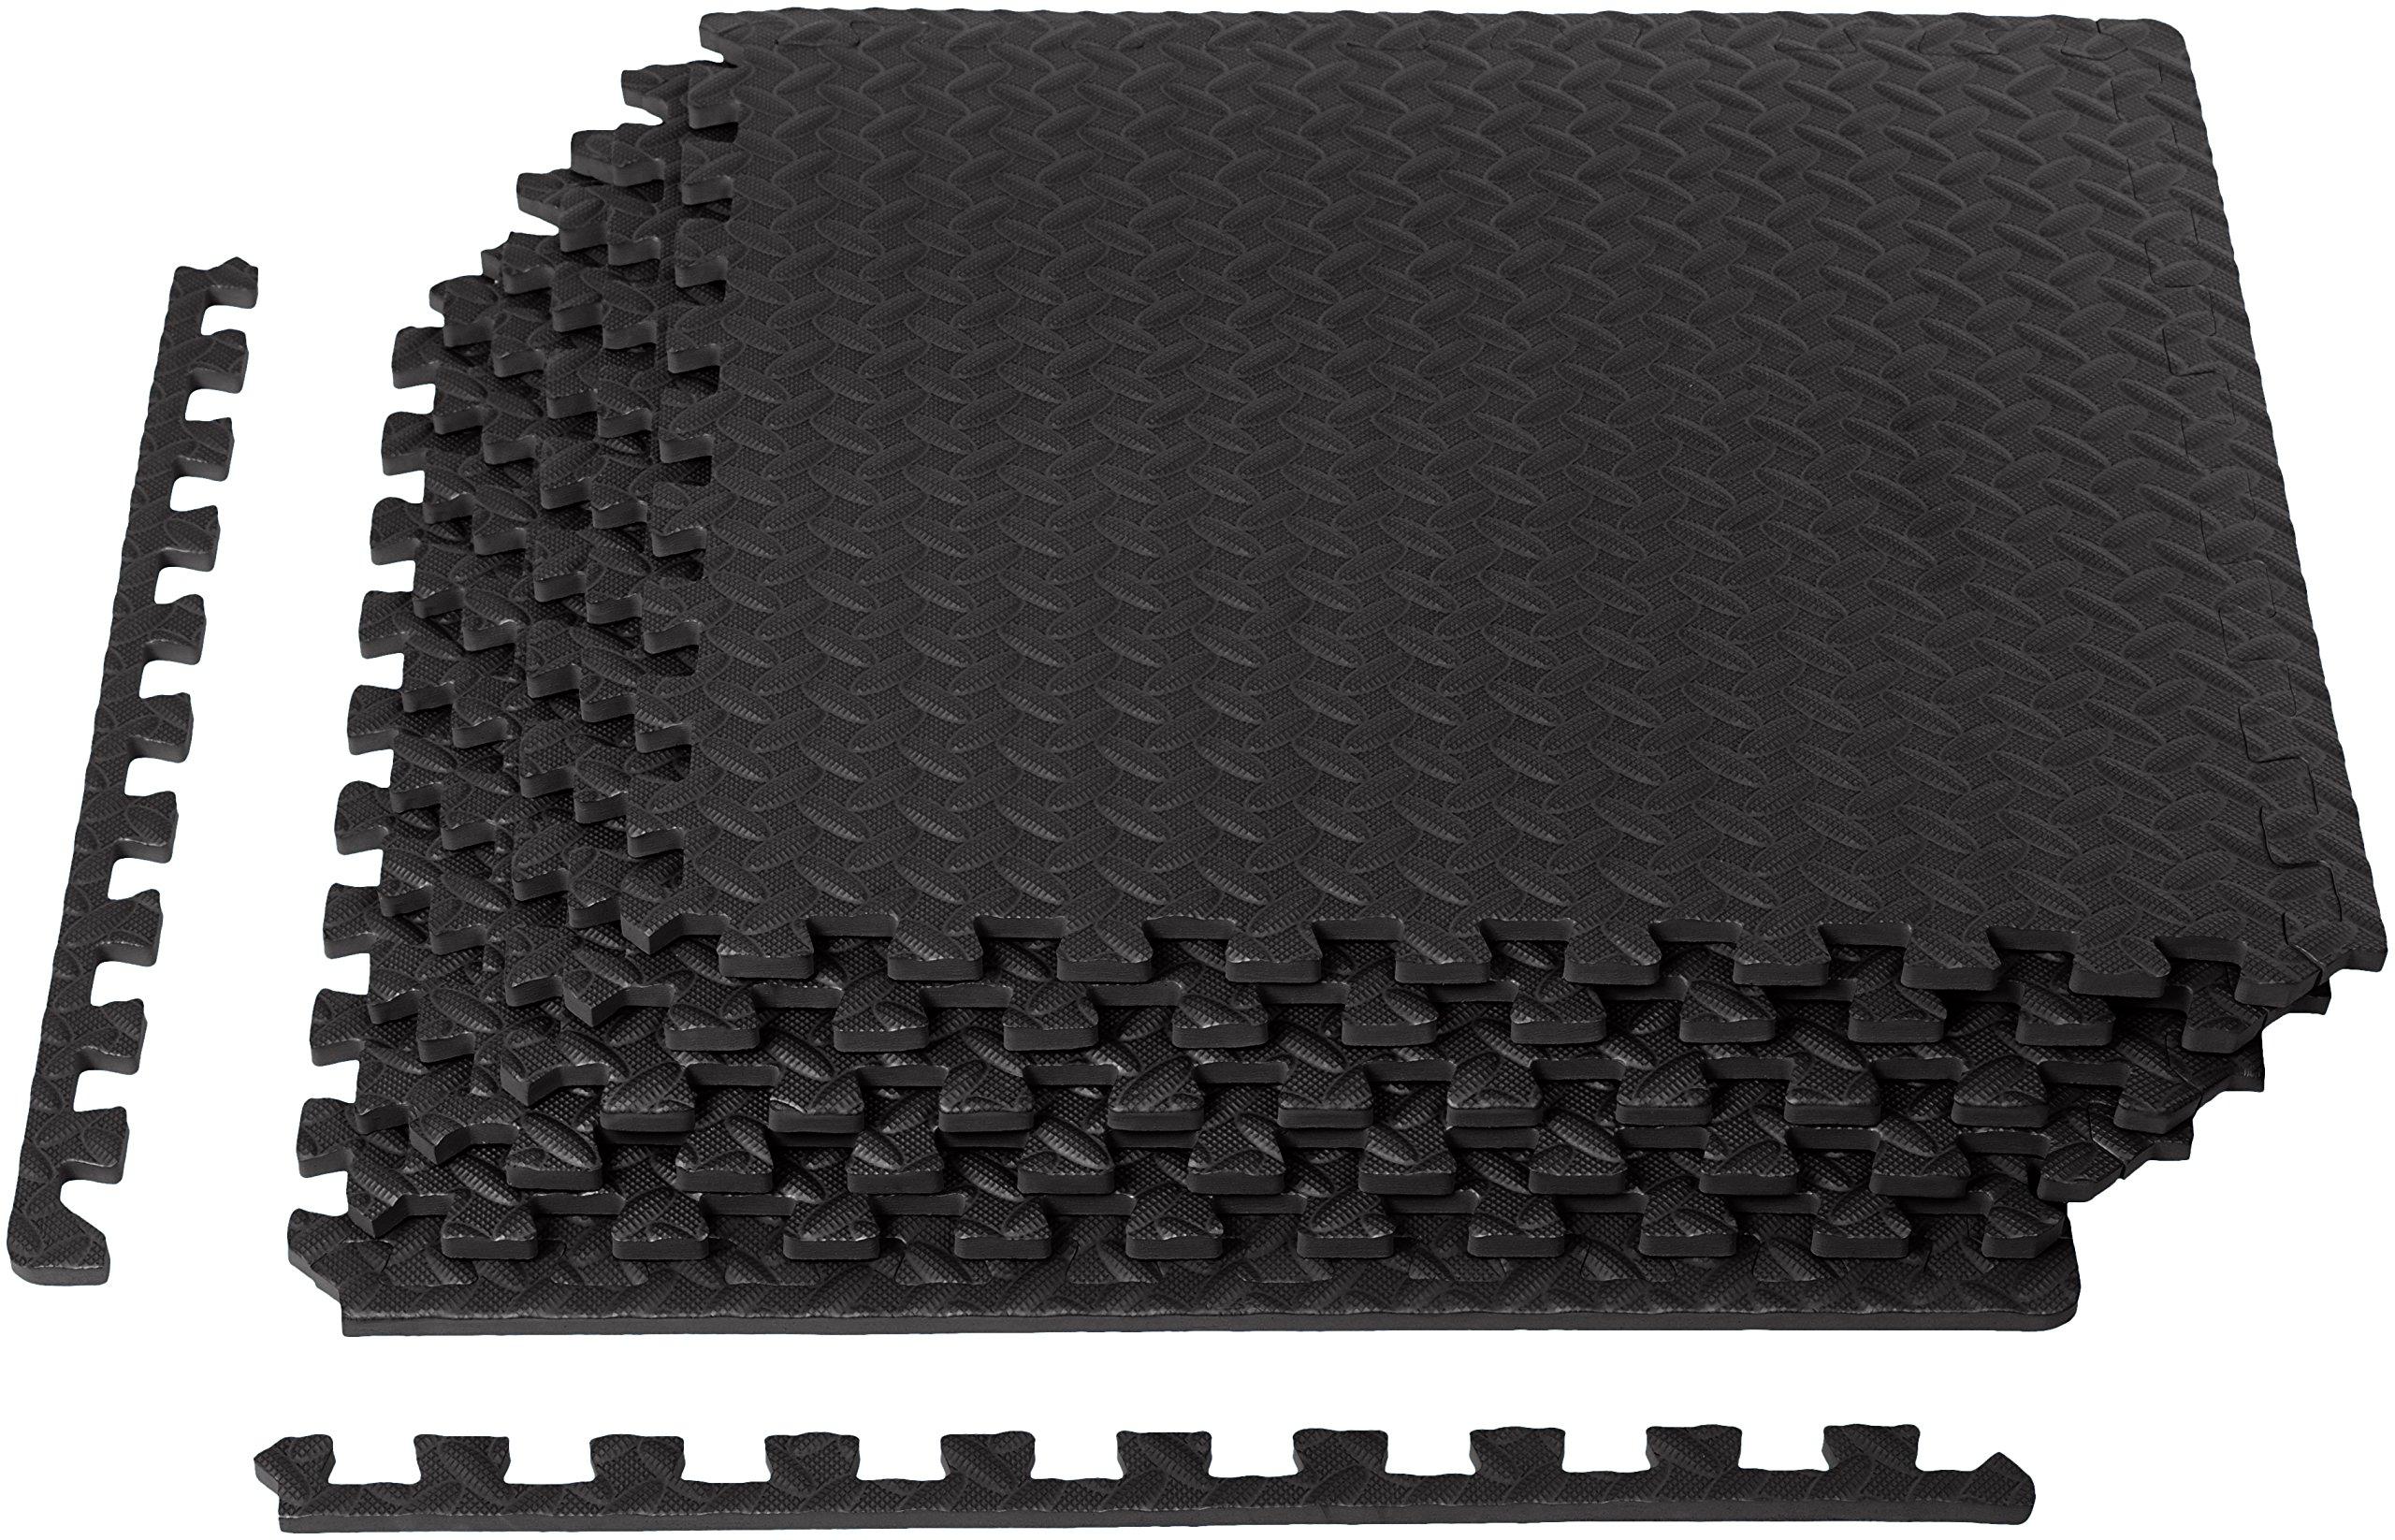 AmazonBasics EVA Foam Interlocking Exercise Gym Floor Mat Tiles - Pack of 6, 24 x 24 x .5 Inches, Black